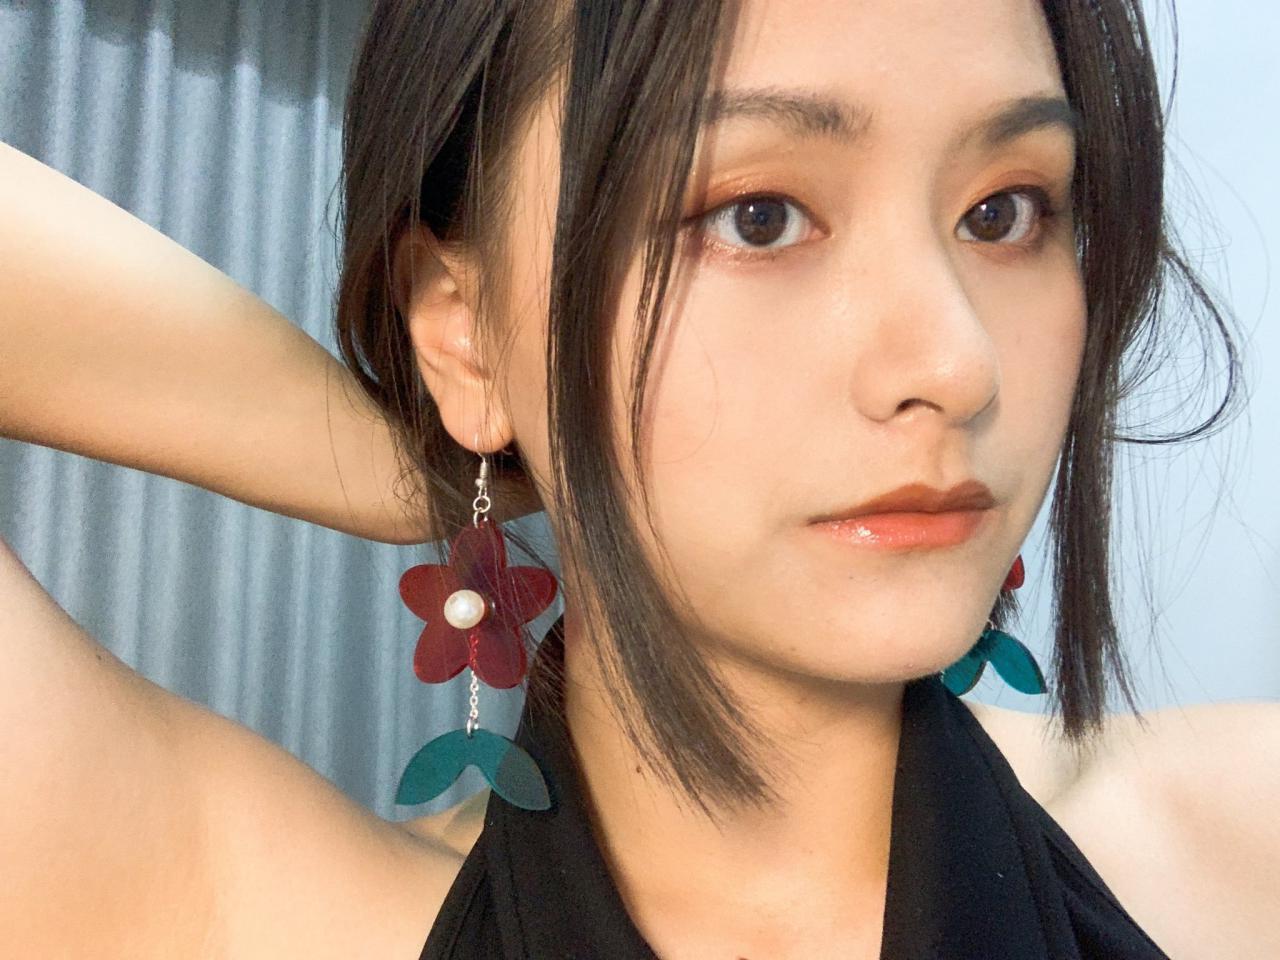 photo_2019-09-09_16-51-34.jpg